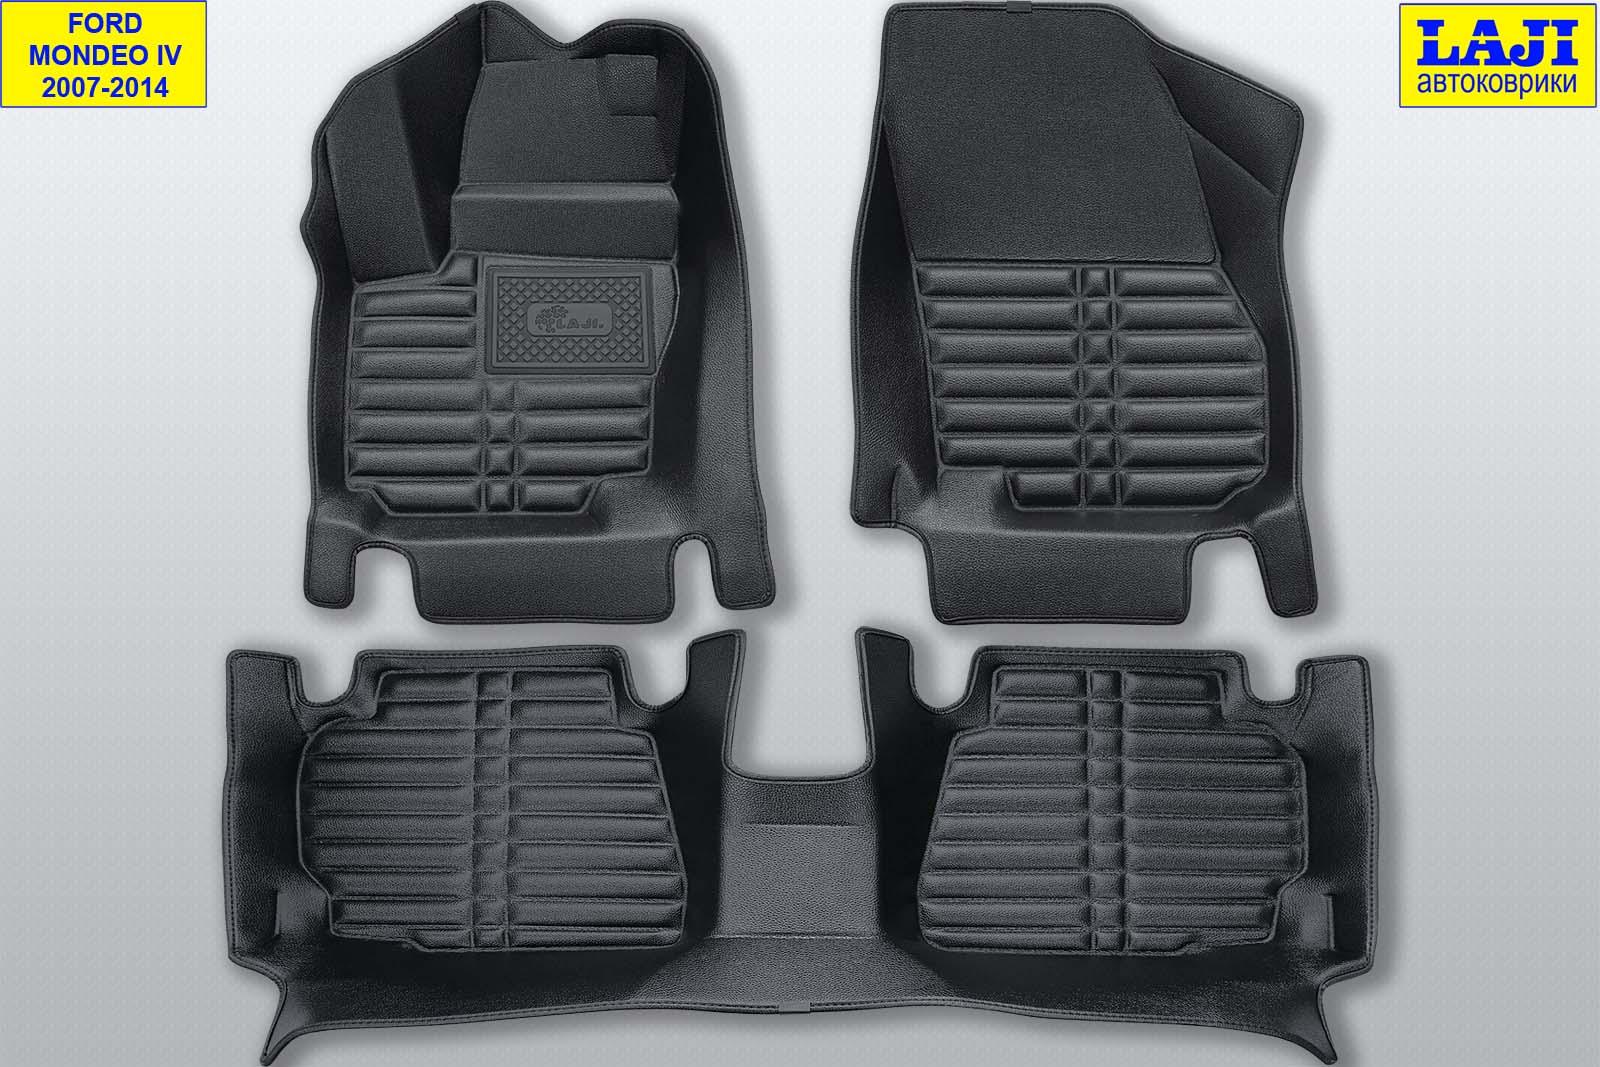 5D коврики в салон Ford Mondeo 4 2007-2014 1